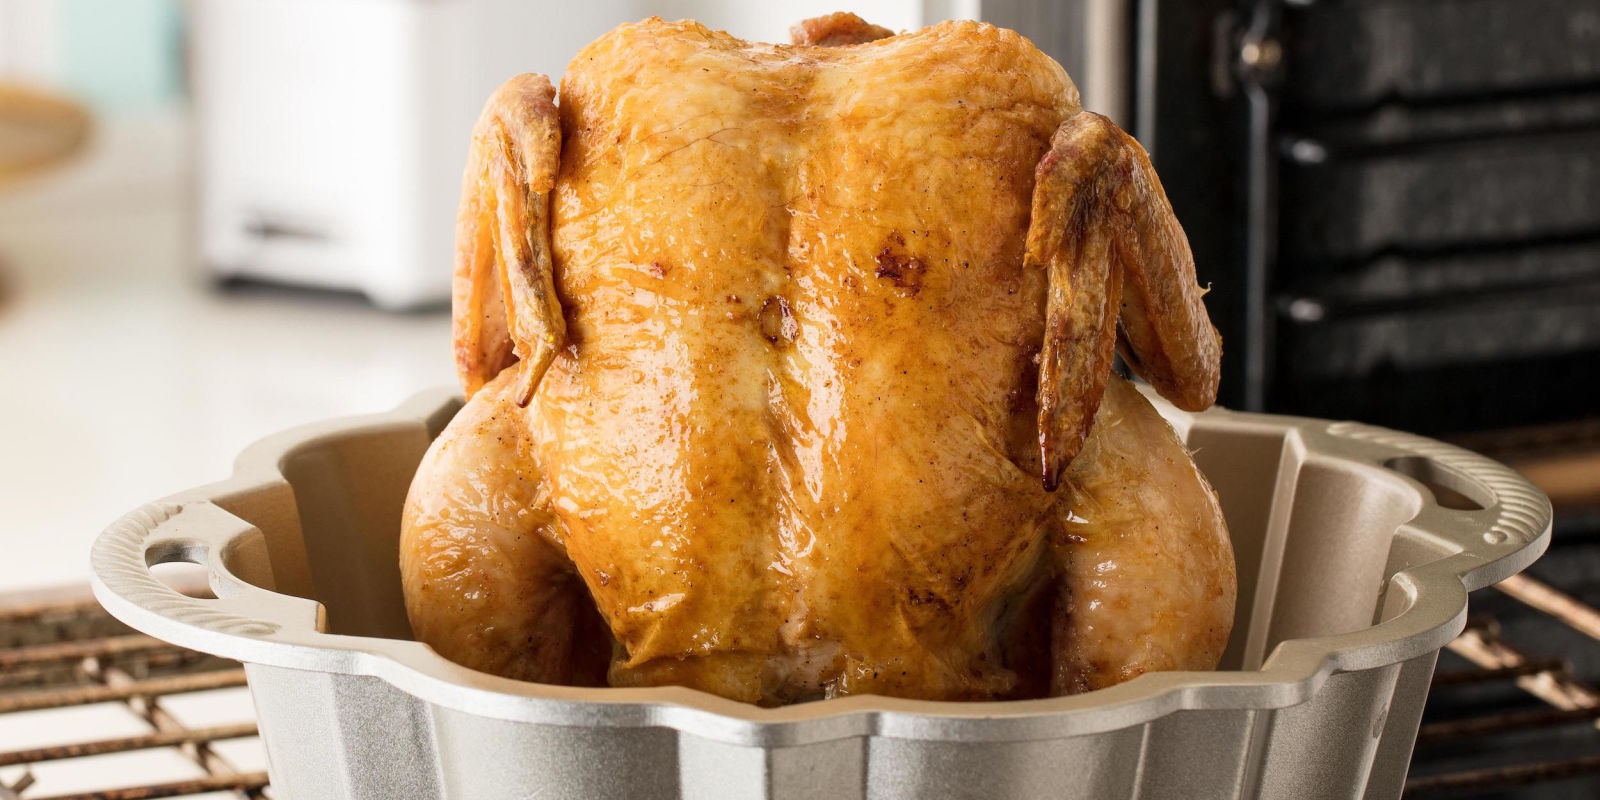 Best Bundt Pan Rotisserie Chicken How To Make Bundt Pan